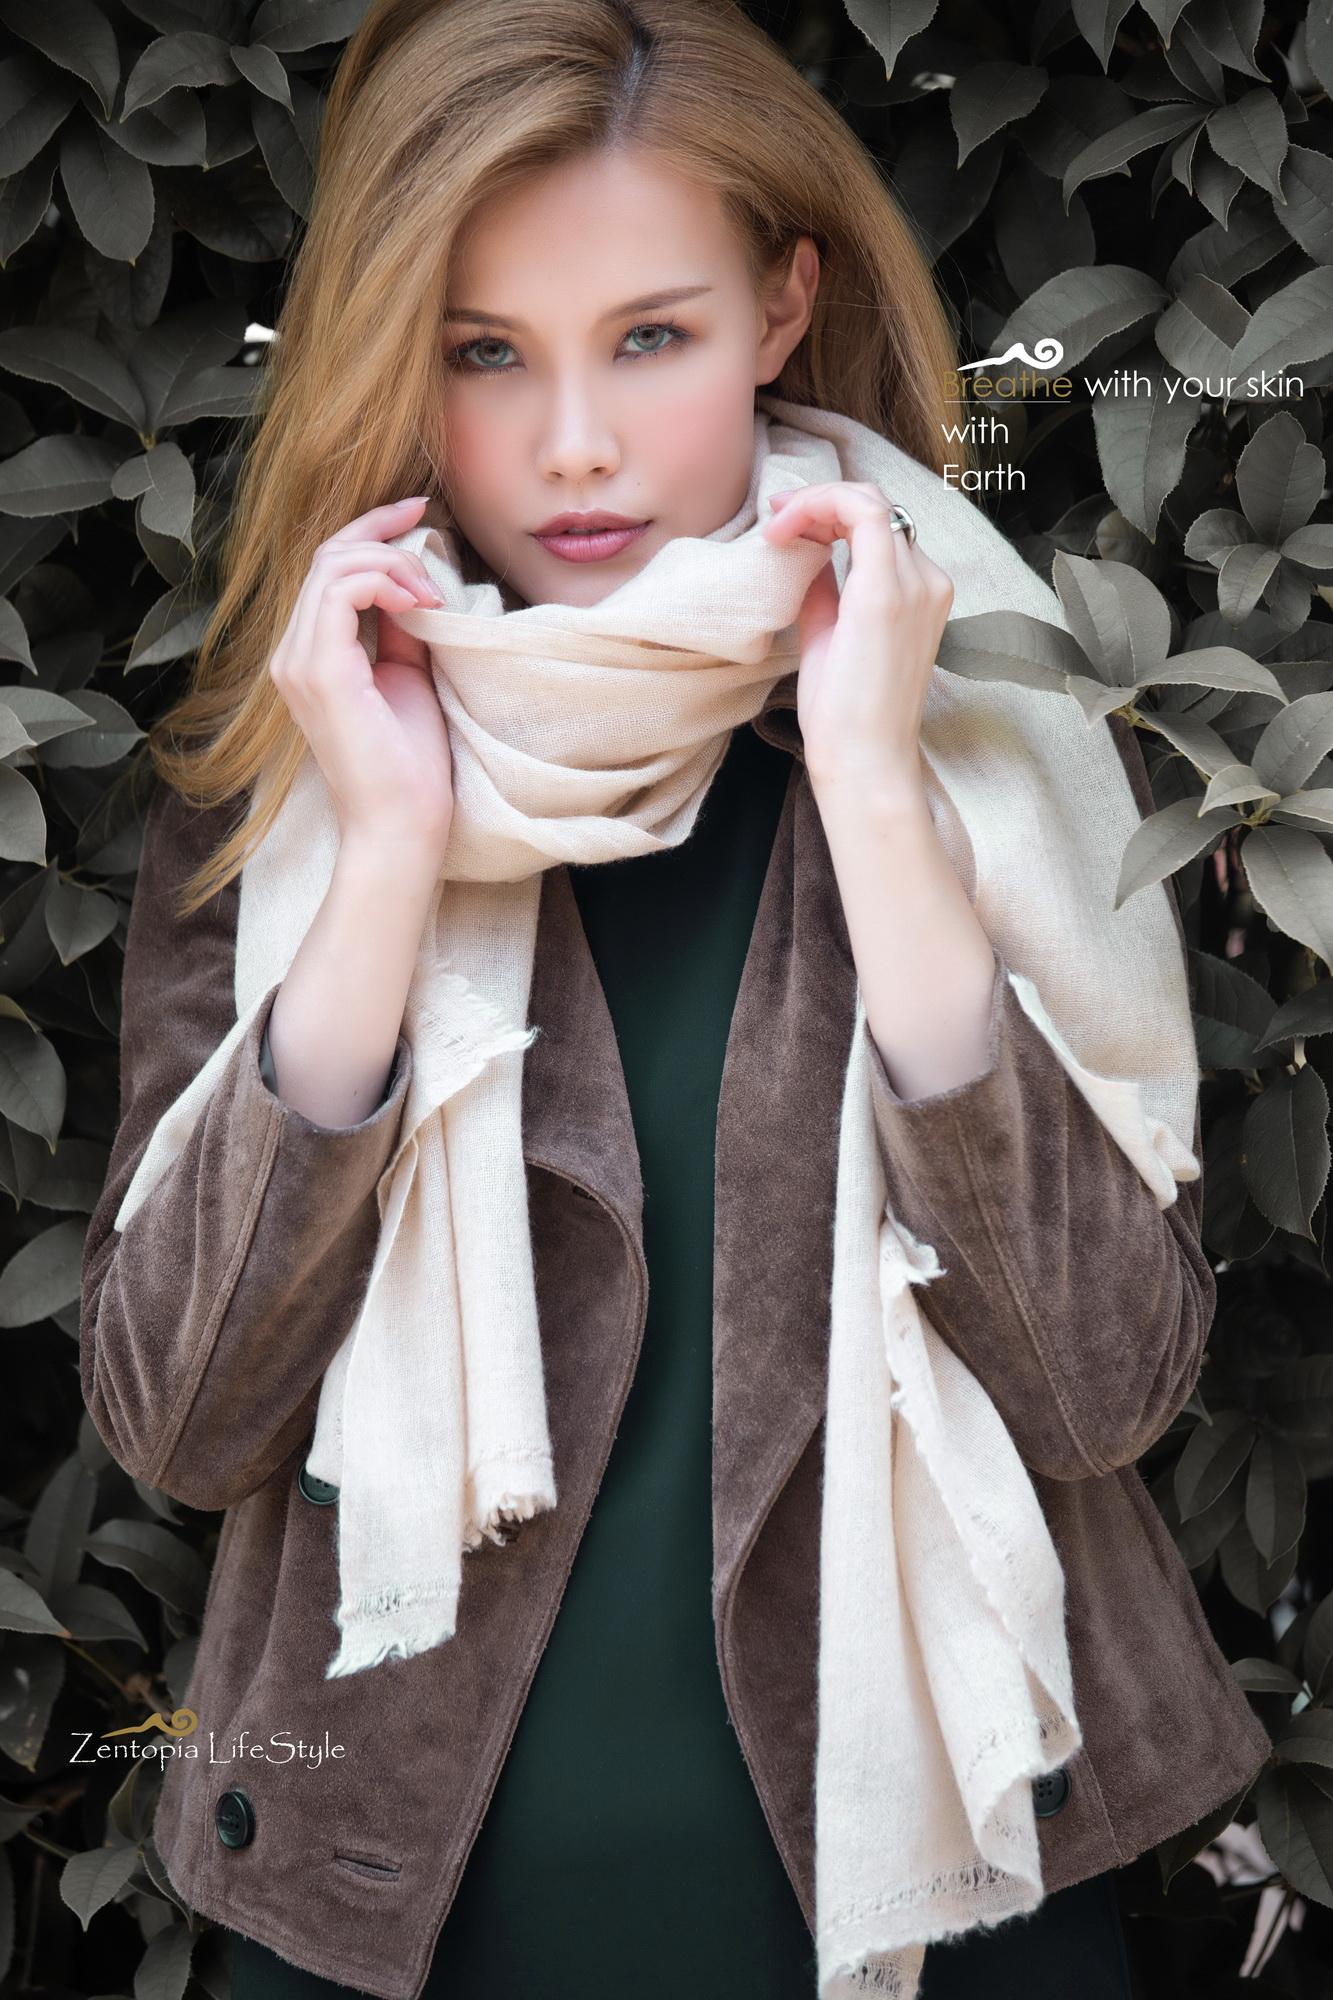 zentopia品牌經典,原色無染100%cashmere圍巾